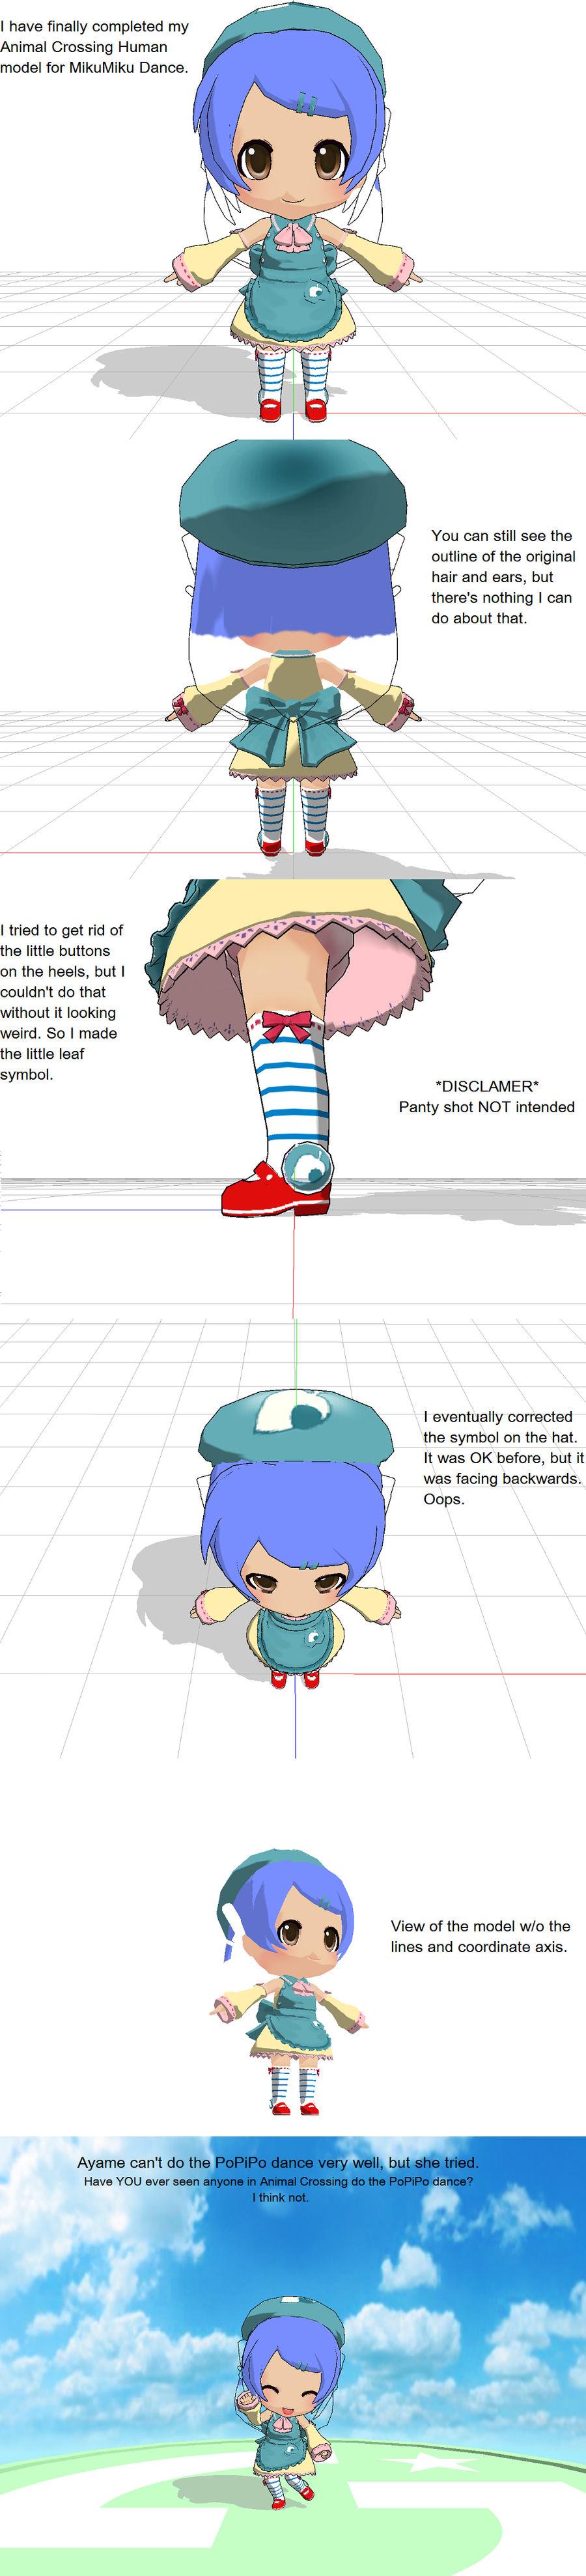 Animal Crossing Mmd By Sailor Pikmin On Deviantart